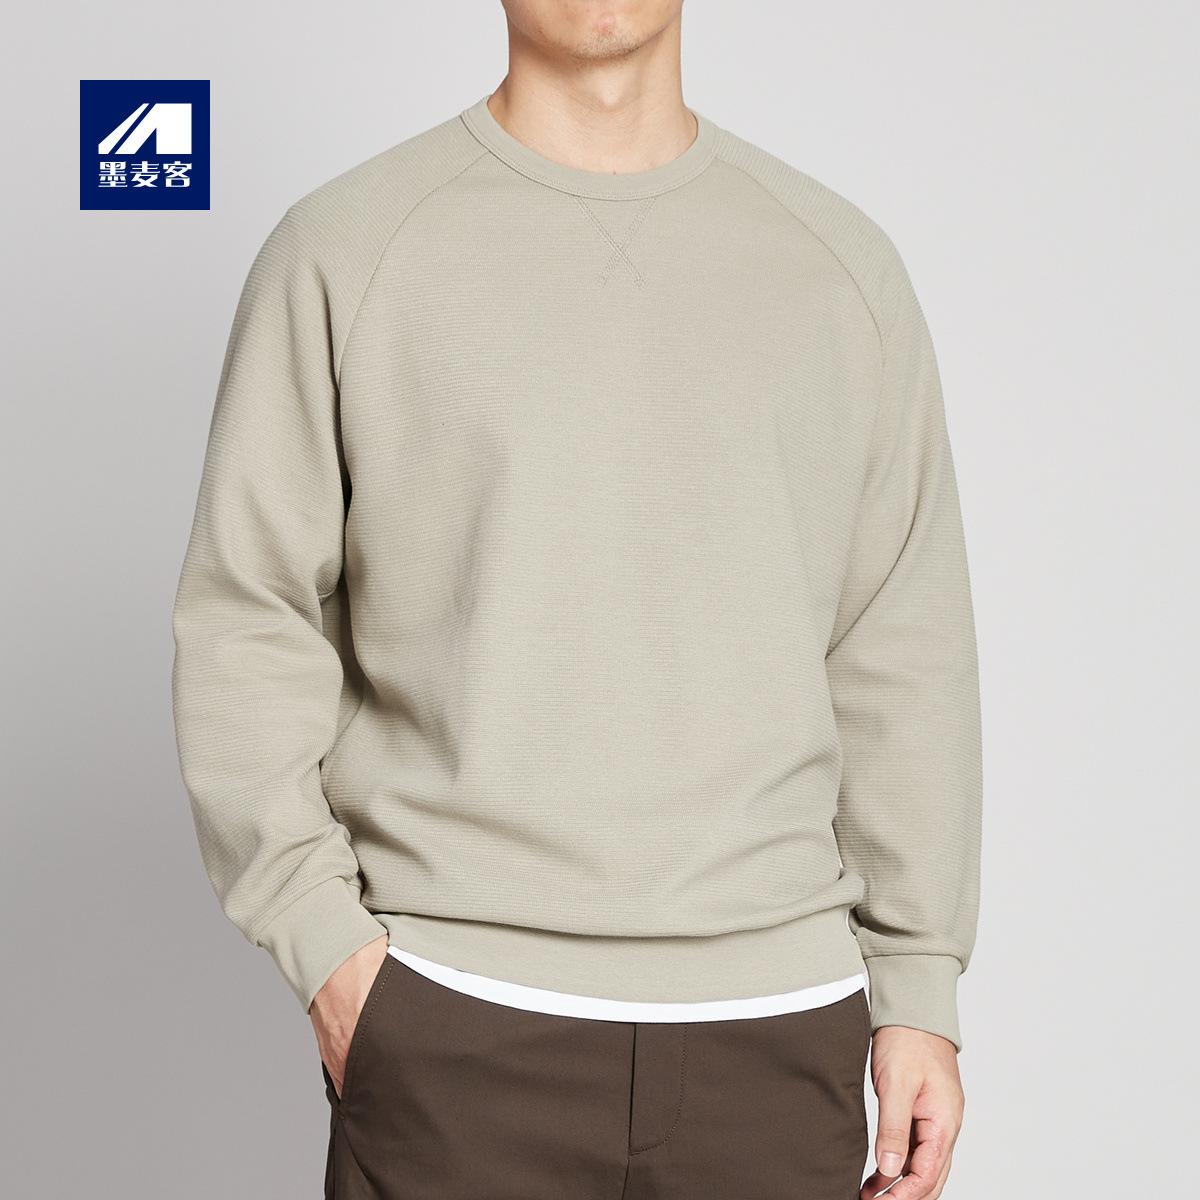 M-MAICCO Men's mohamak autumn 2020 new style raglan sleeve sweater men's solid round neck long sle